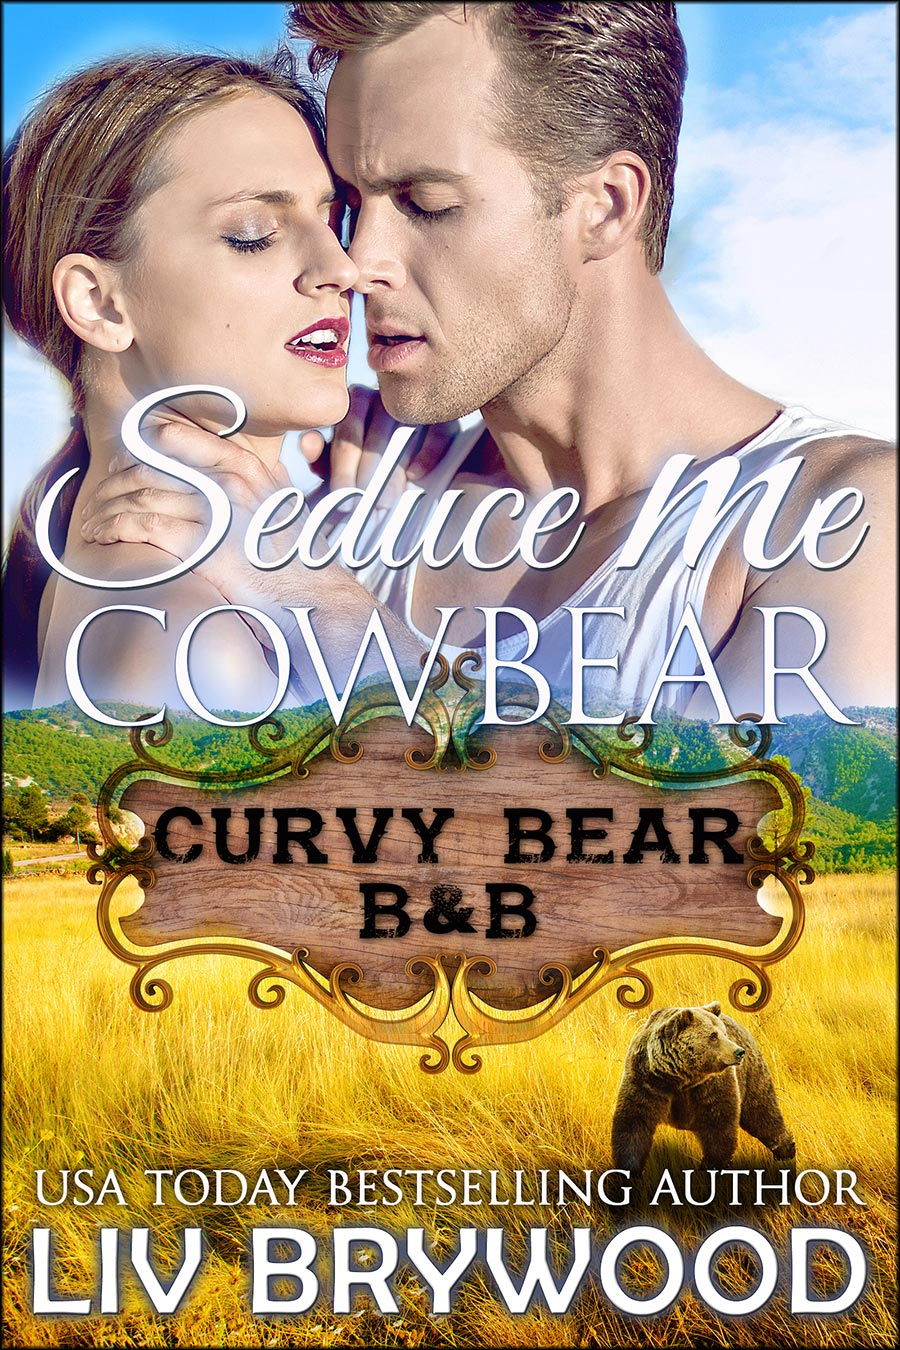 Seduce-Me-Cowbear-1600.jpg